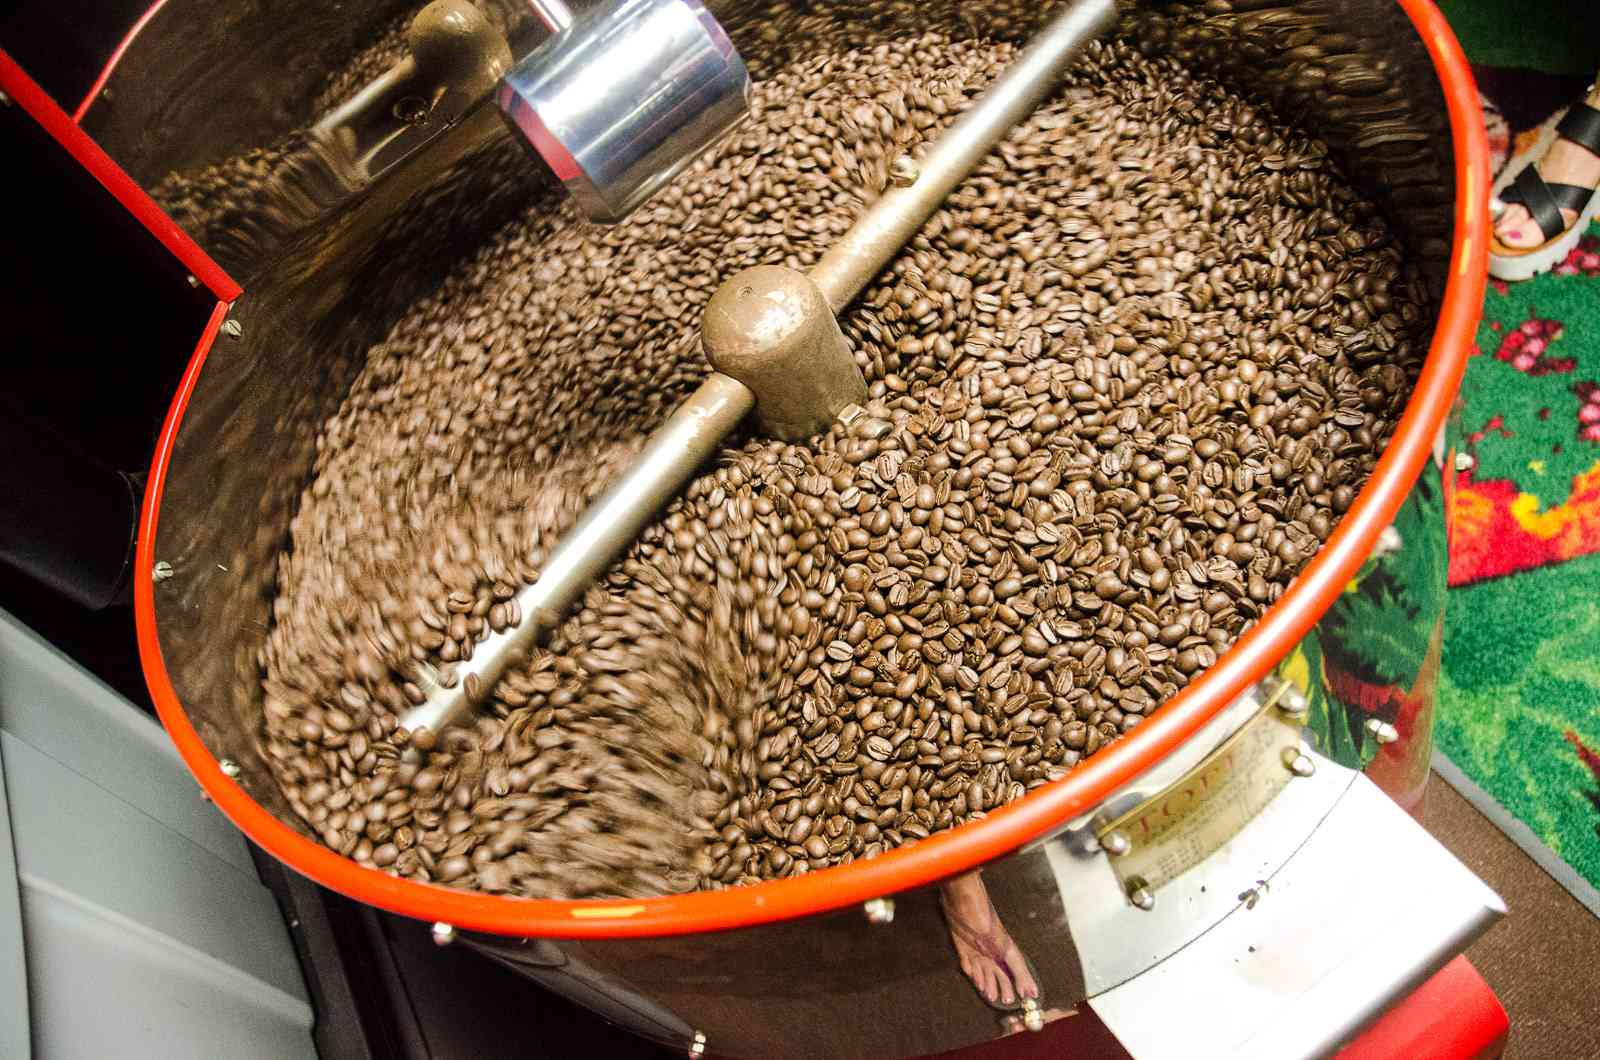 Kona coffee roasting at MJA Vineyards